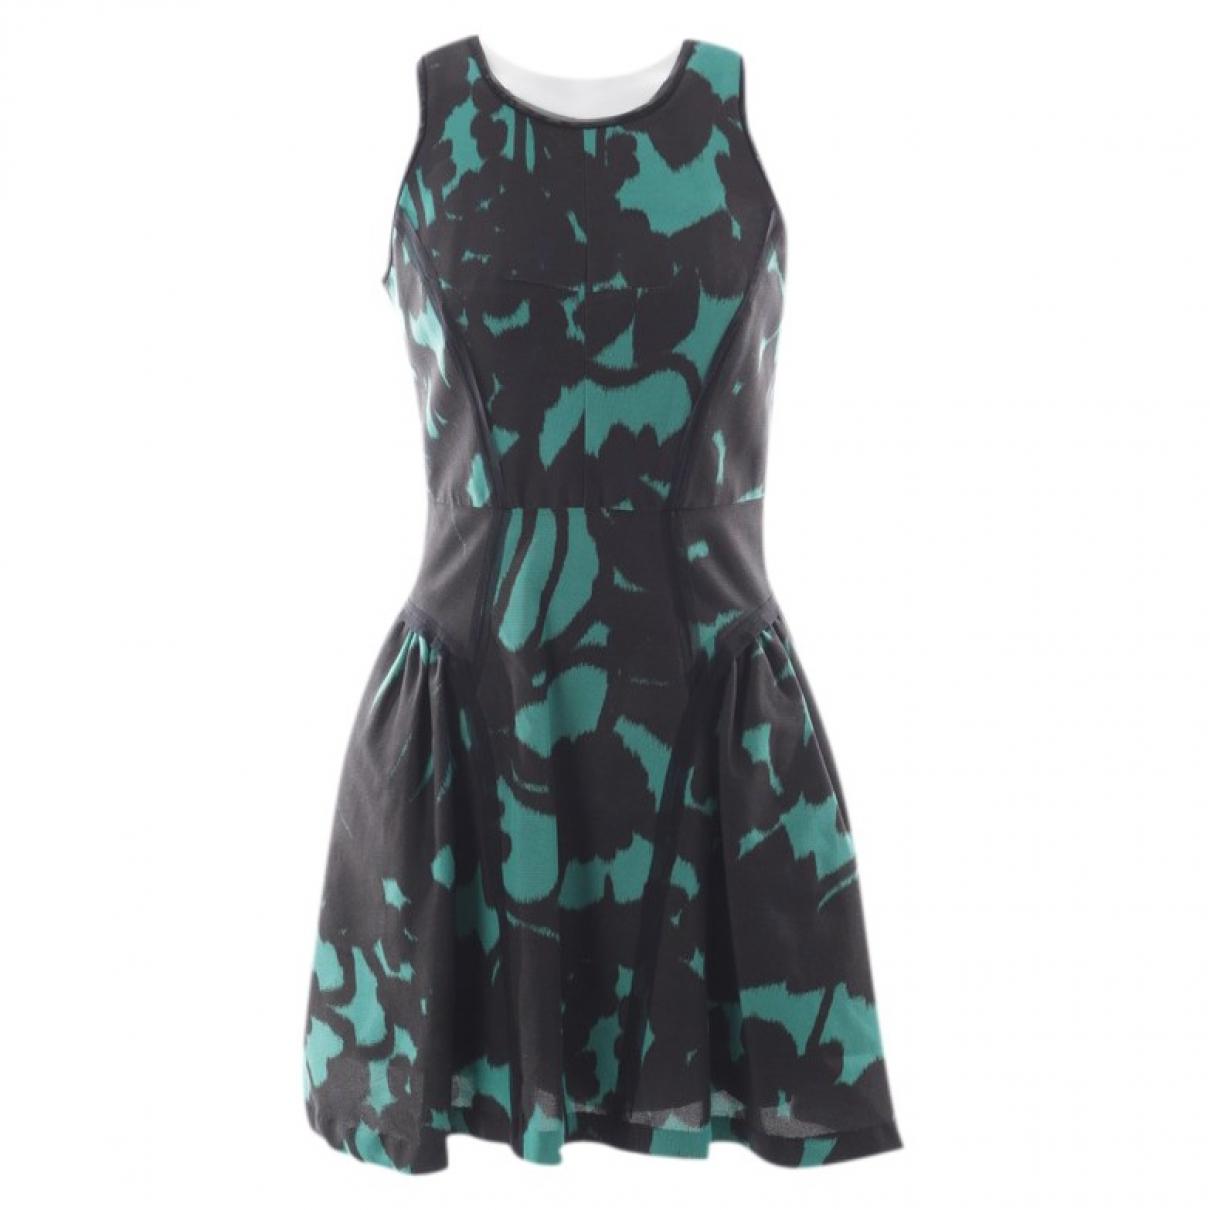 Milly \N Black Cotton dress for Women 34 FR